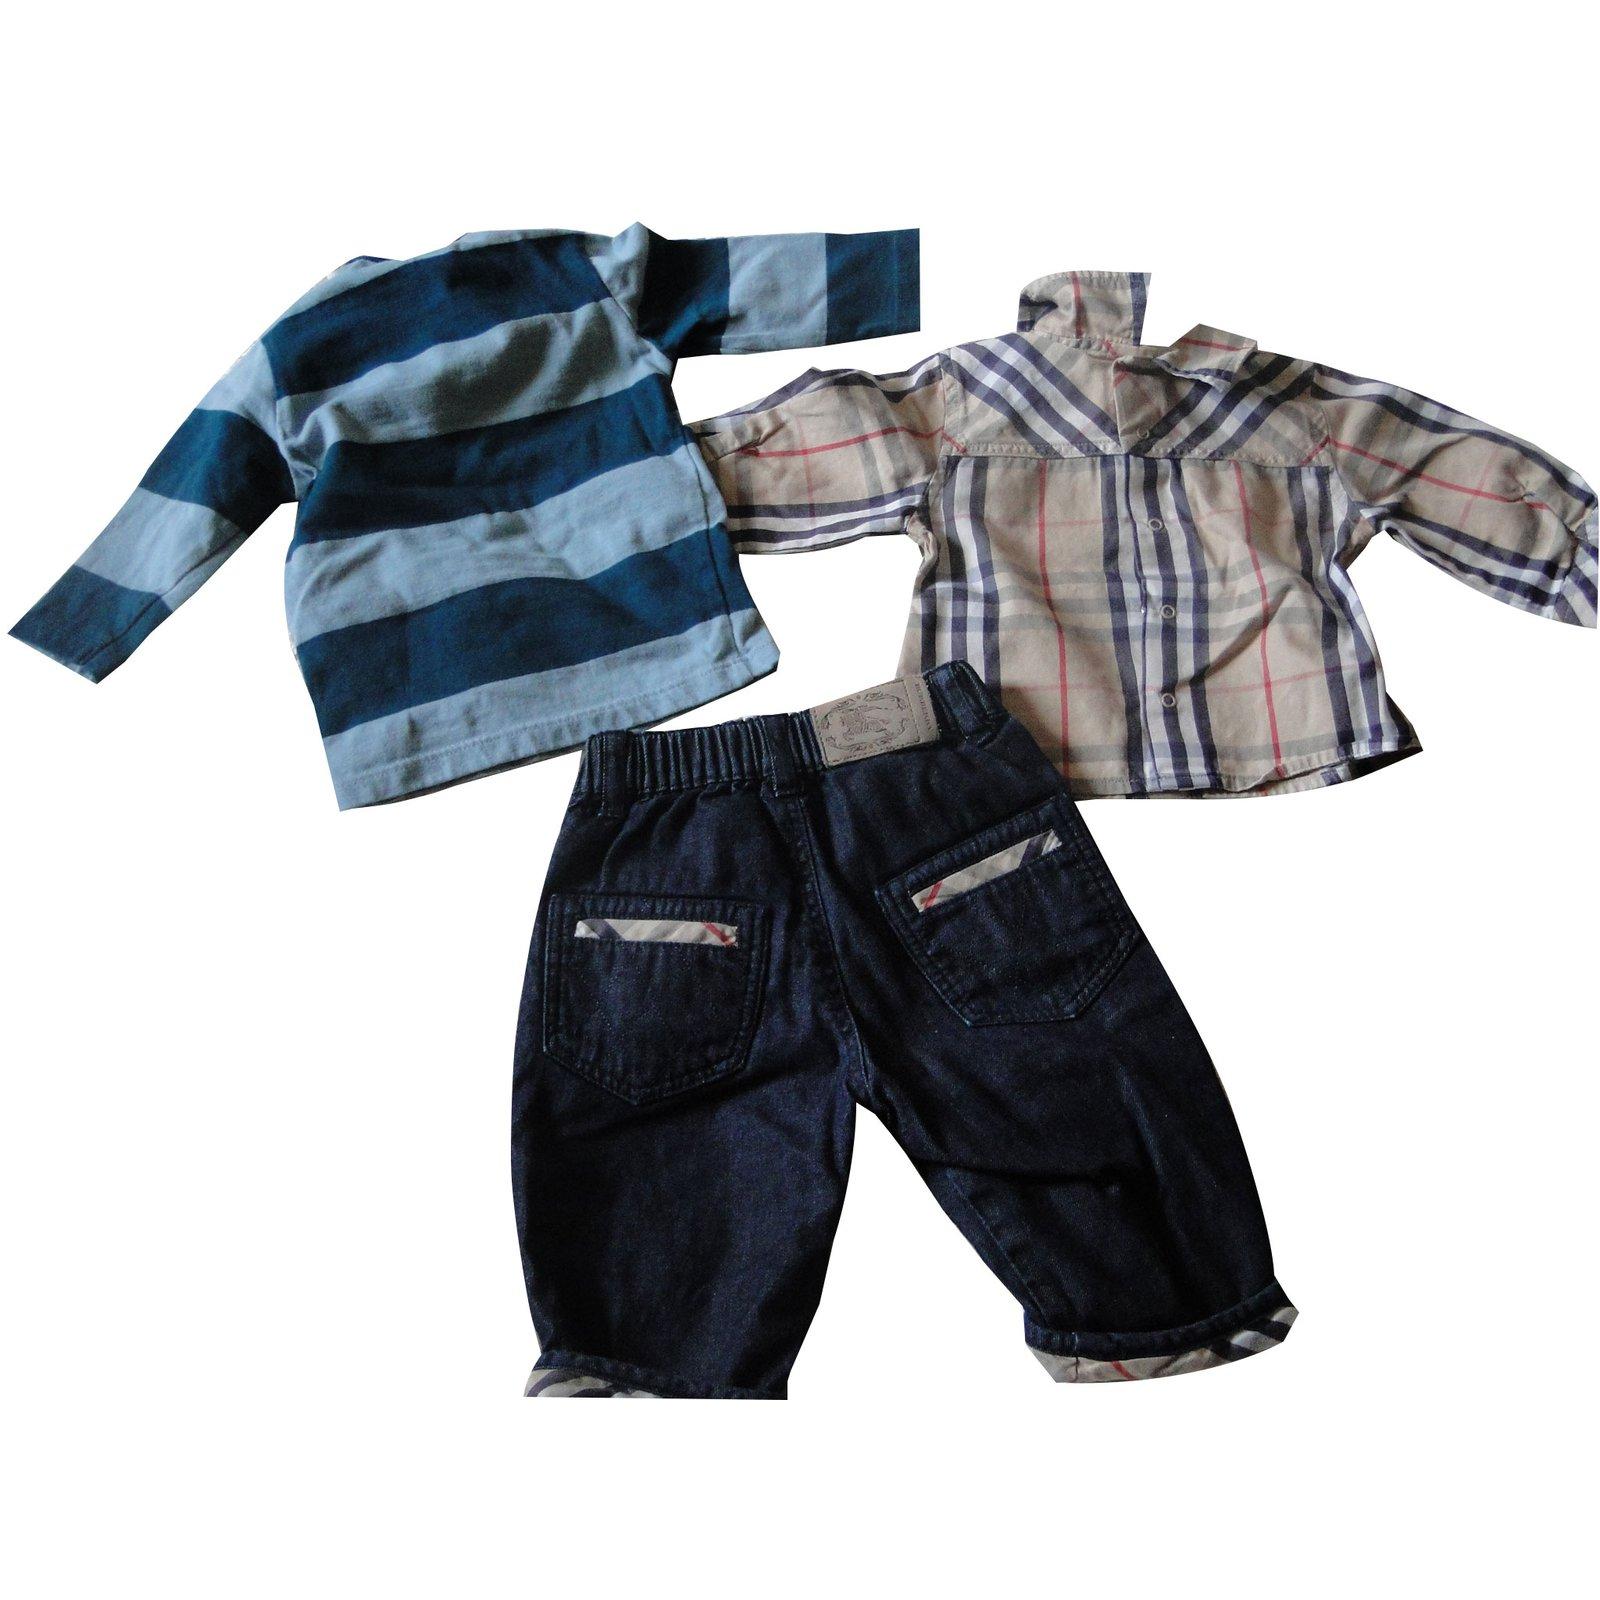 75f3fc36187 Les ensembles garçon Burberry Les ensembles garçon Coton Bleu ref.45399